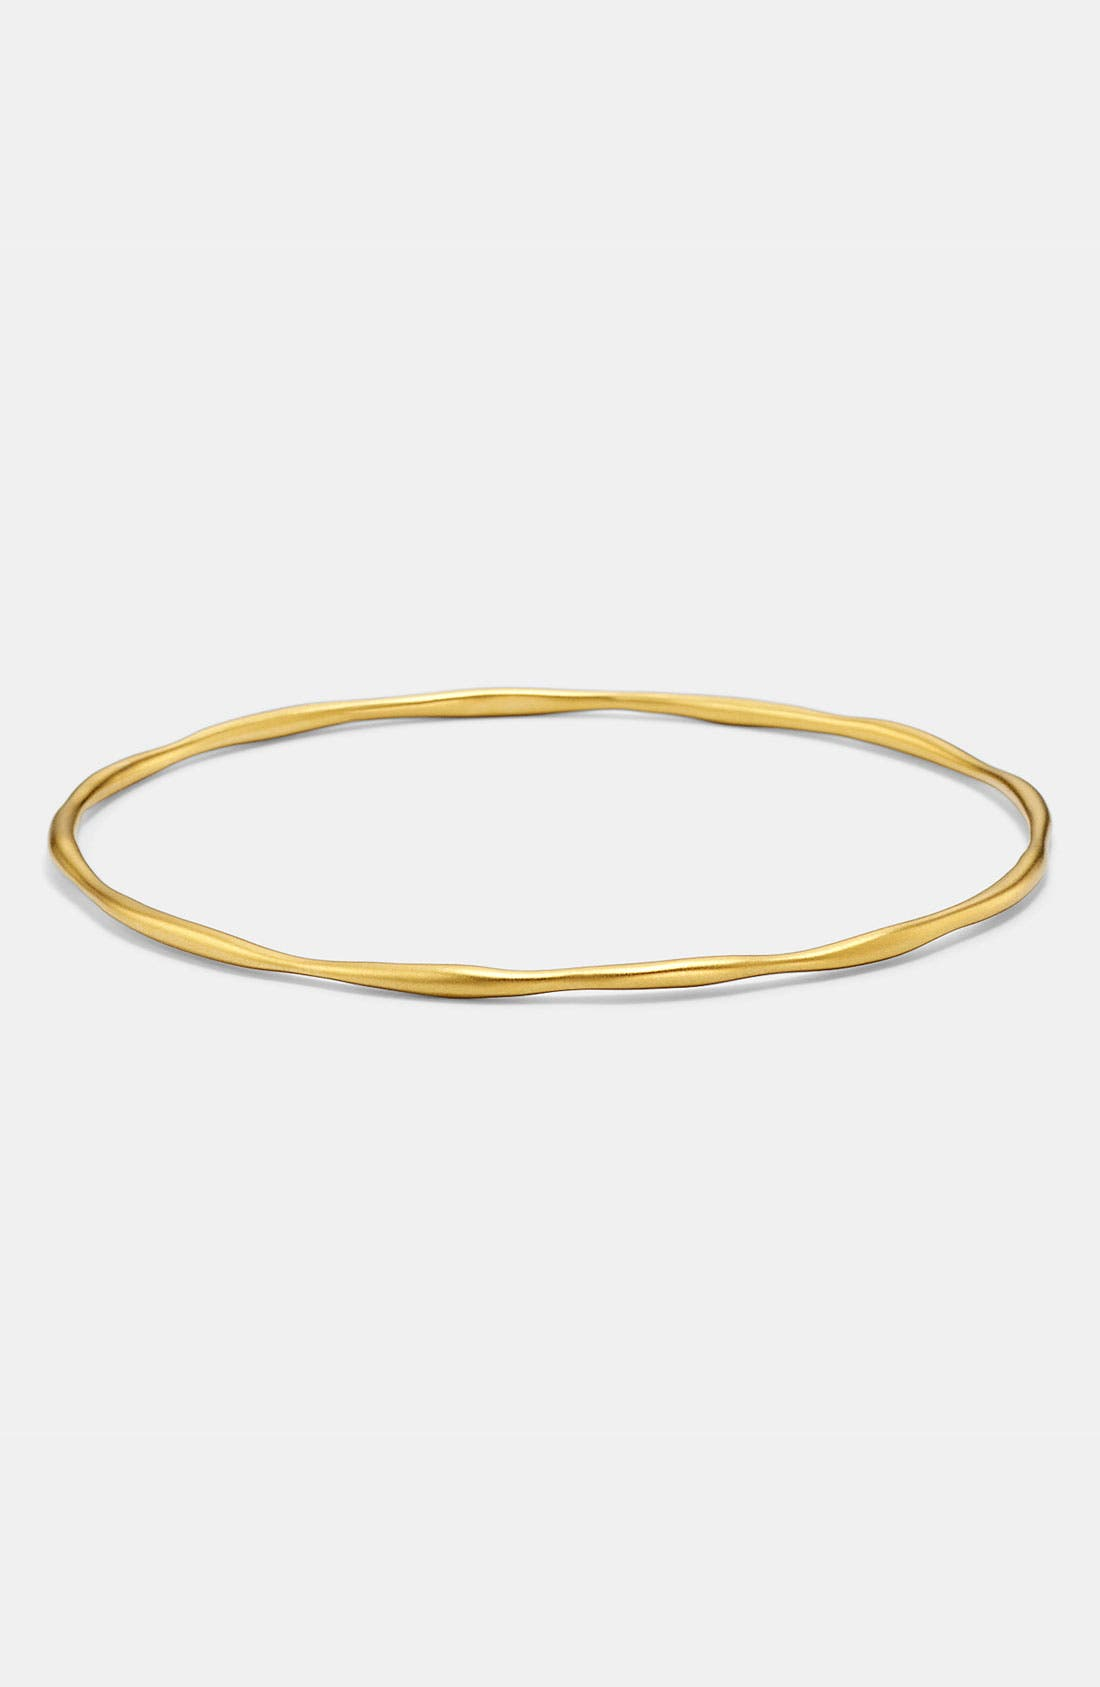 Main Image - Ippolita 'Plain' Matte 18k Gold Bangle